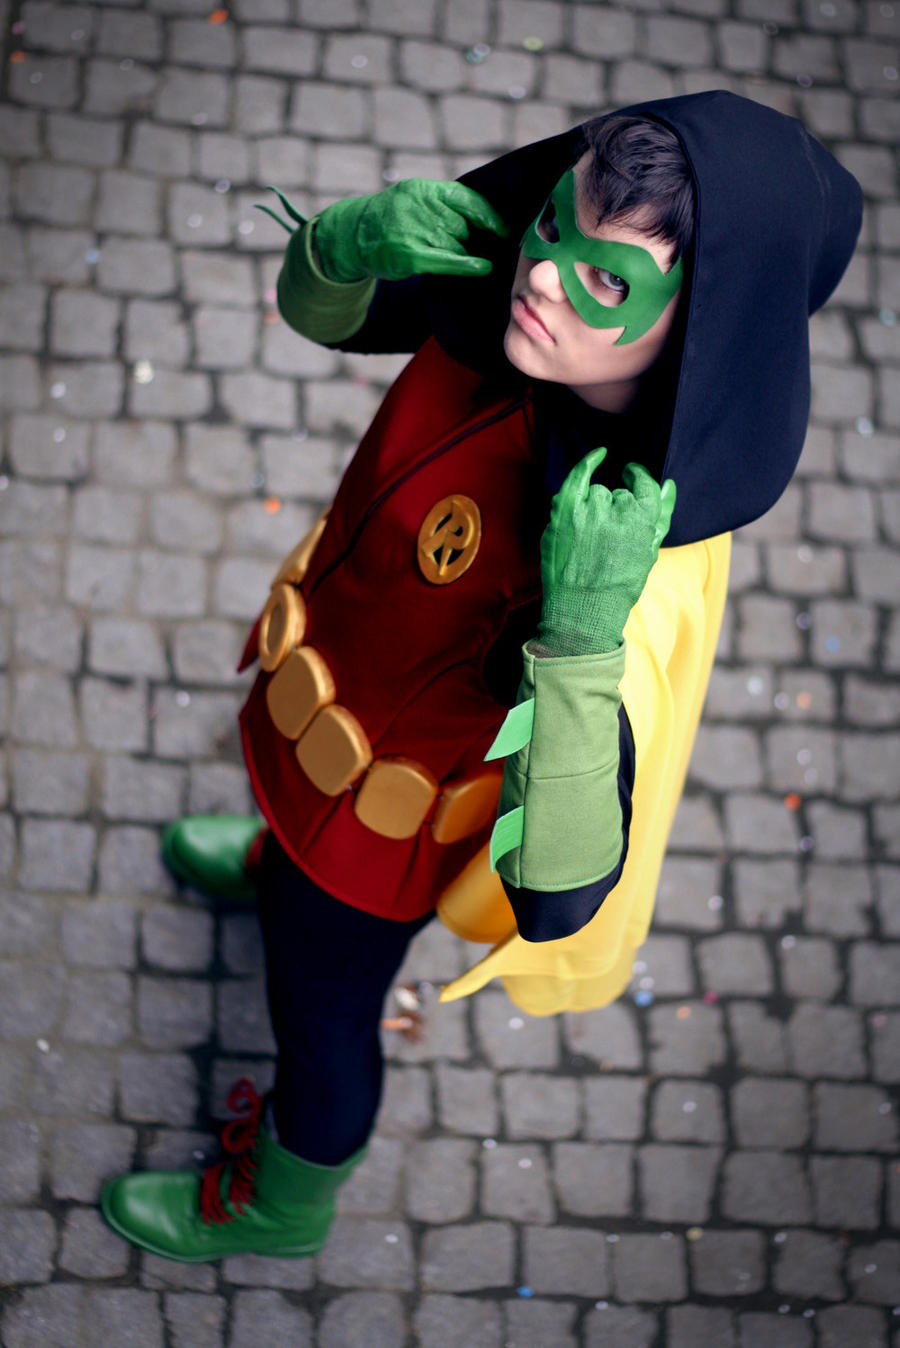 Robin V by dhauber